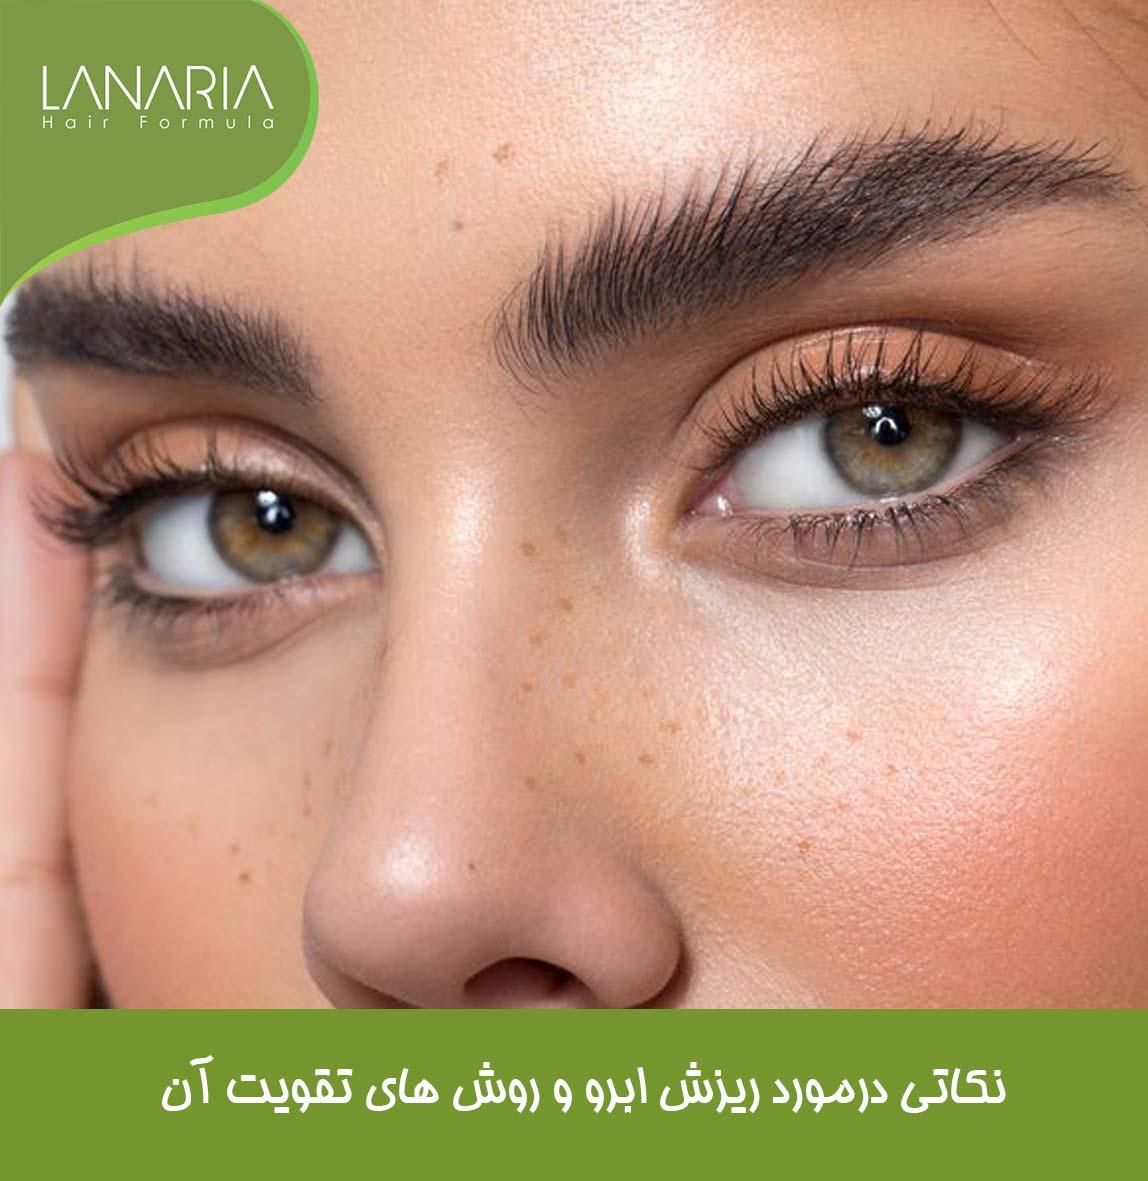 lanaria-eyebrow-loss